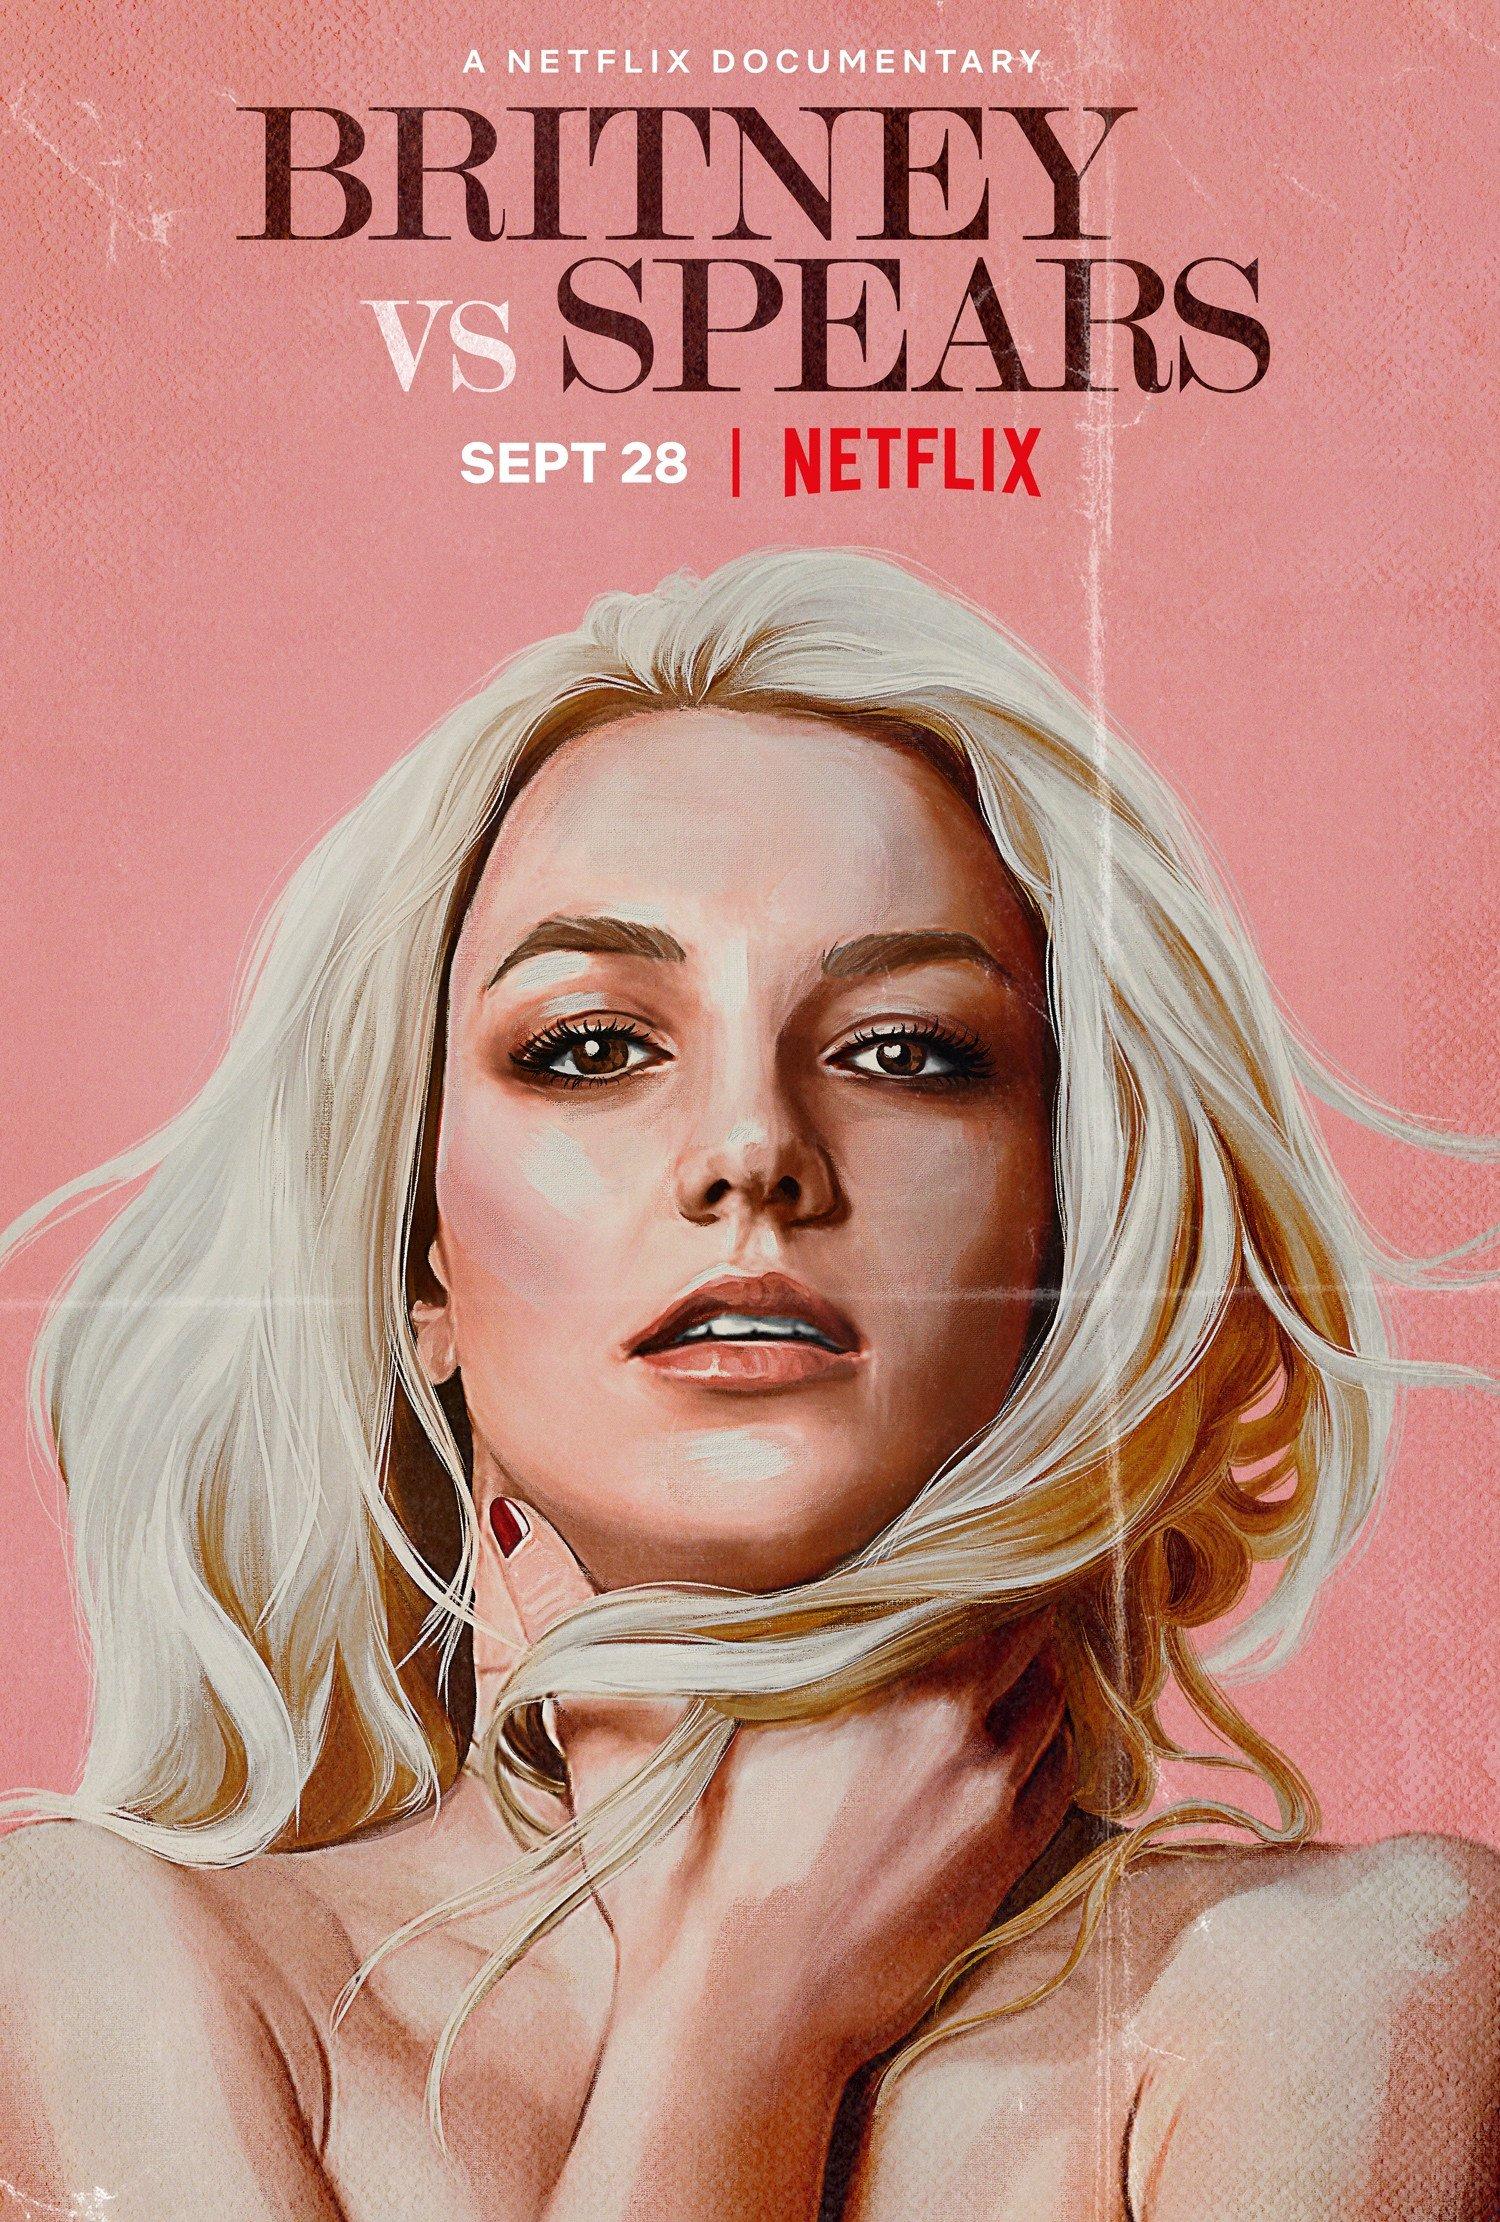 Pôster do documentário 'Britney X Spears'